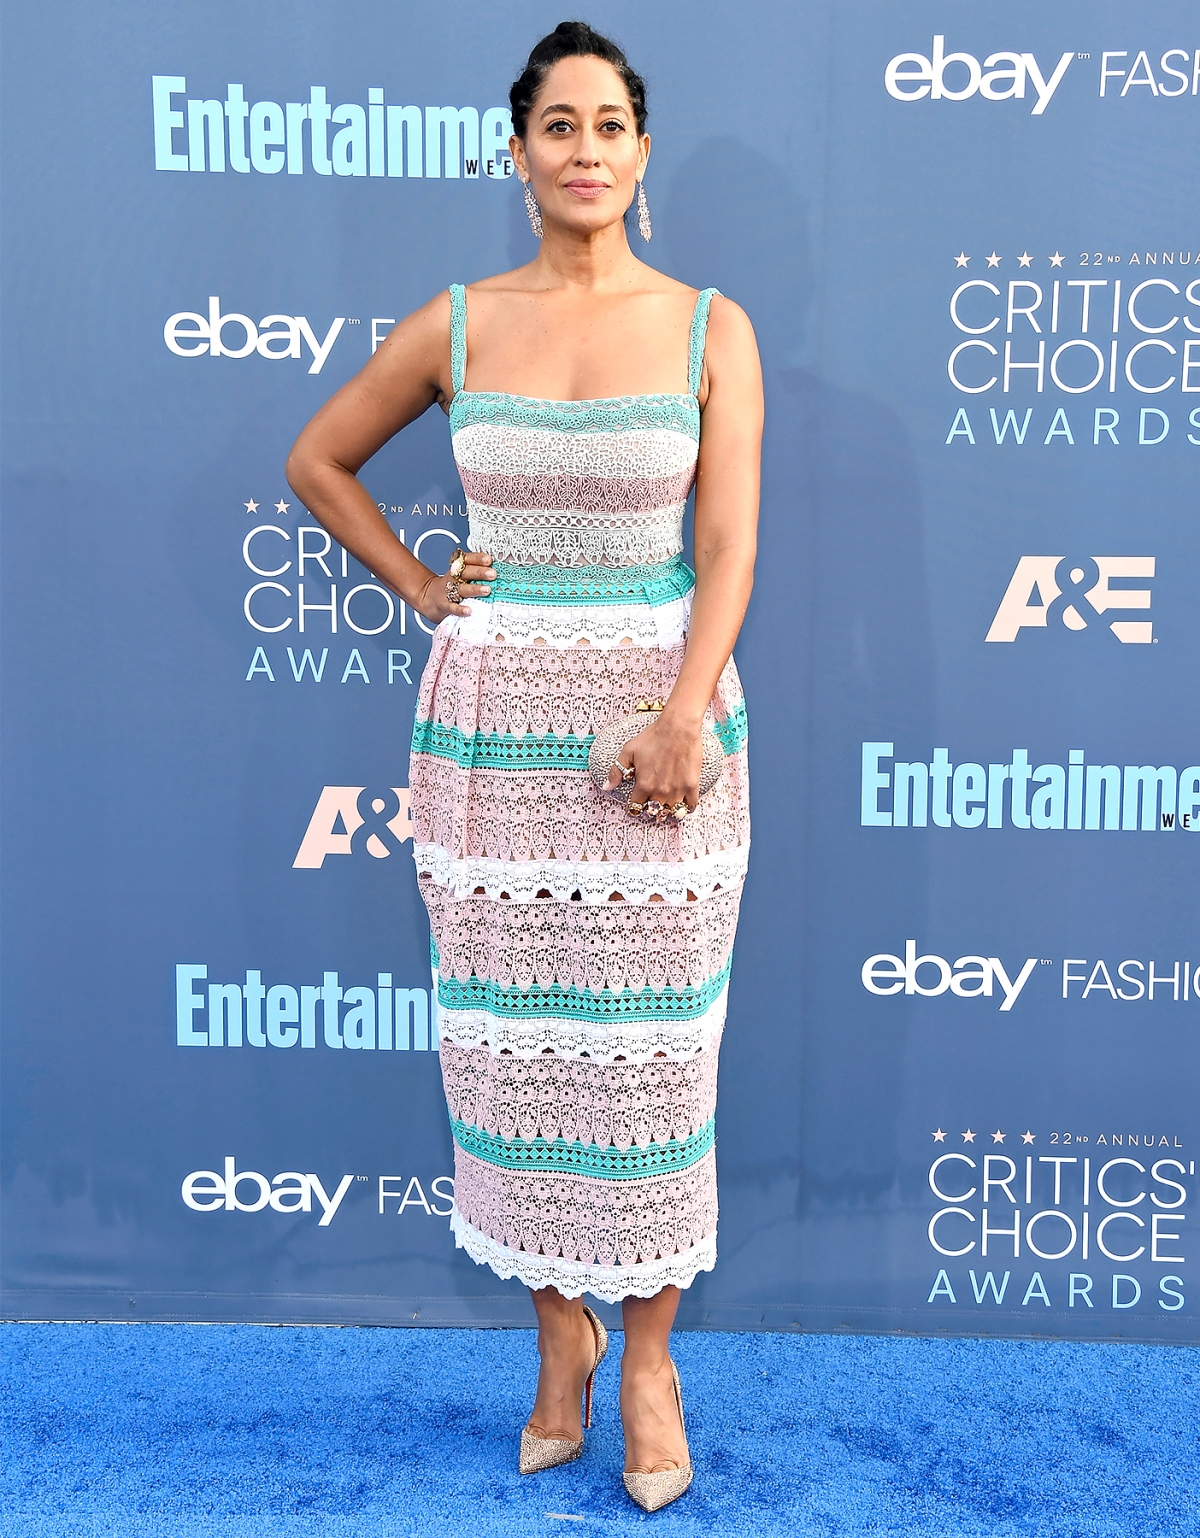 Critics\' Choice Awards 2016 Red Carpet Fashion: Stars\' Style